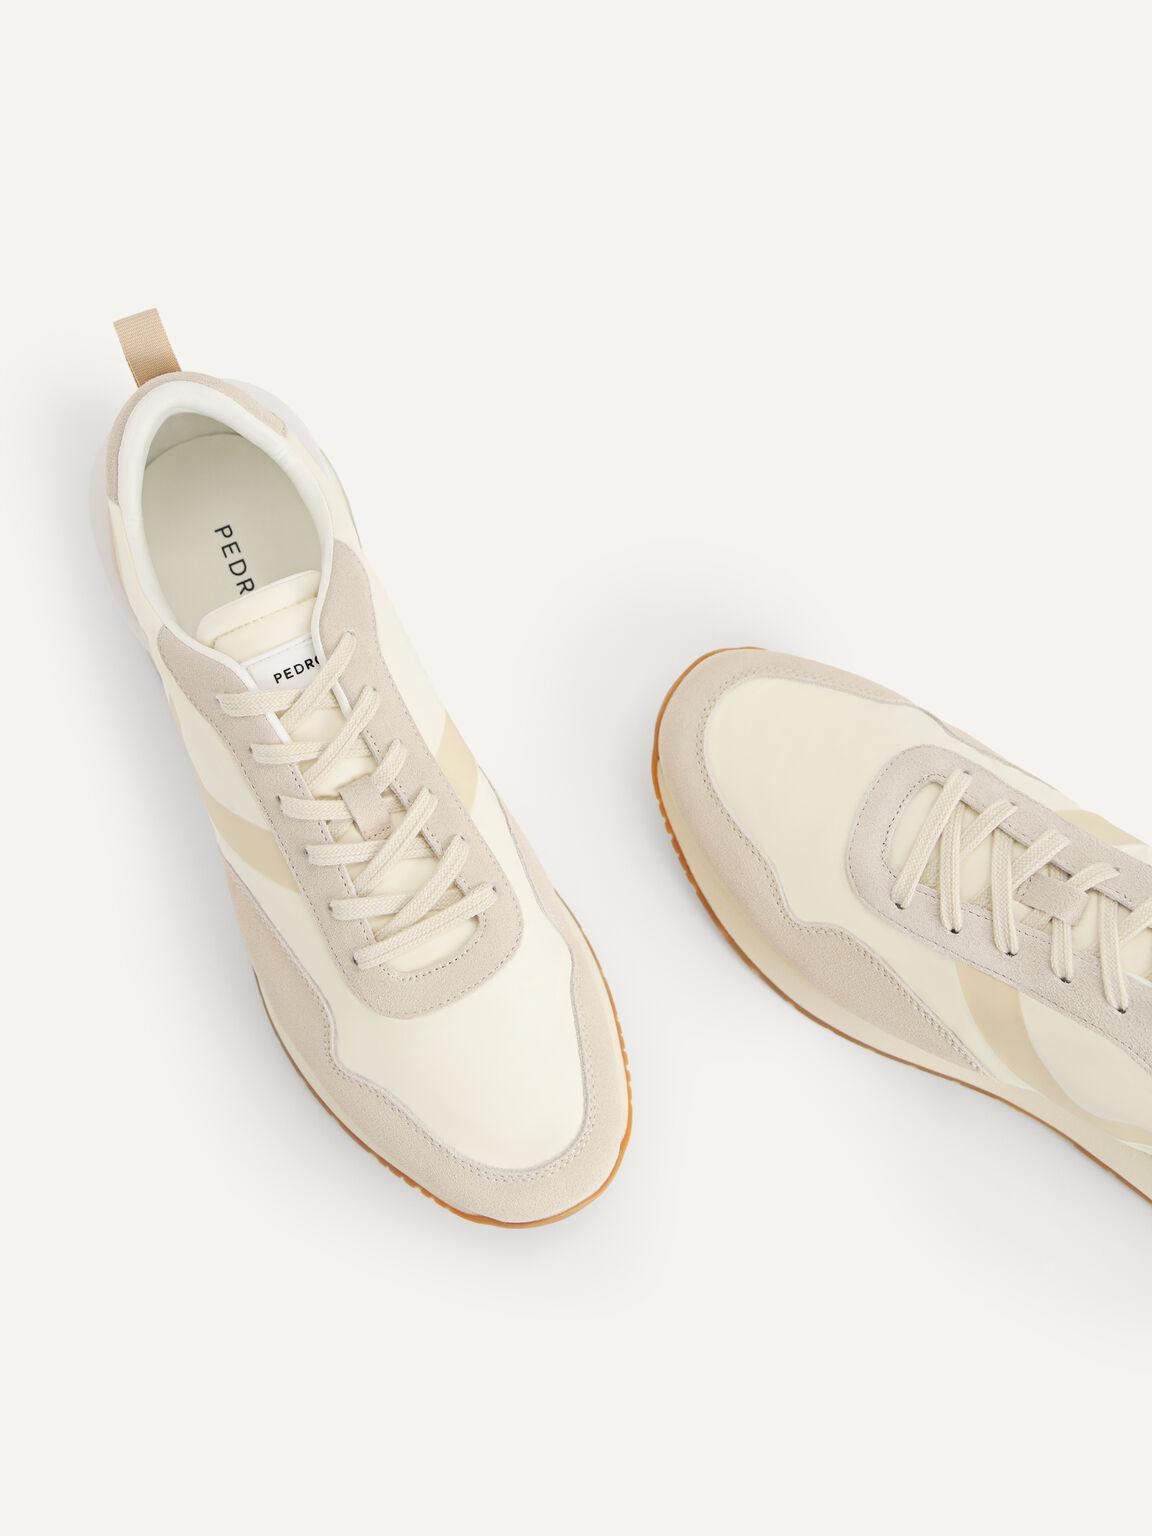 Monochromatic Suede Sneakers, Beige, hi-res